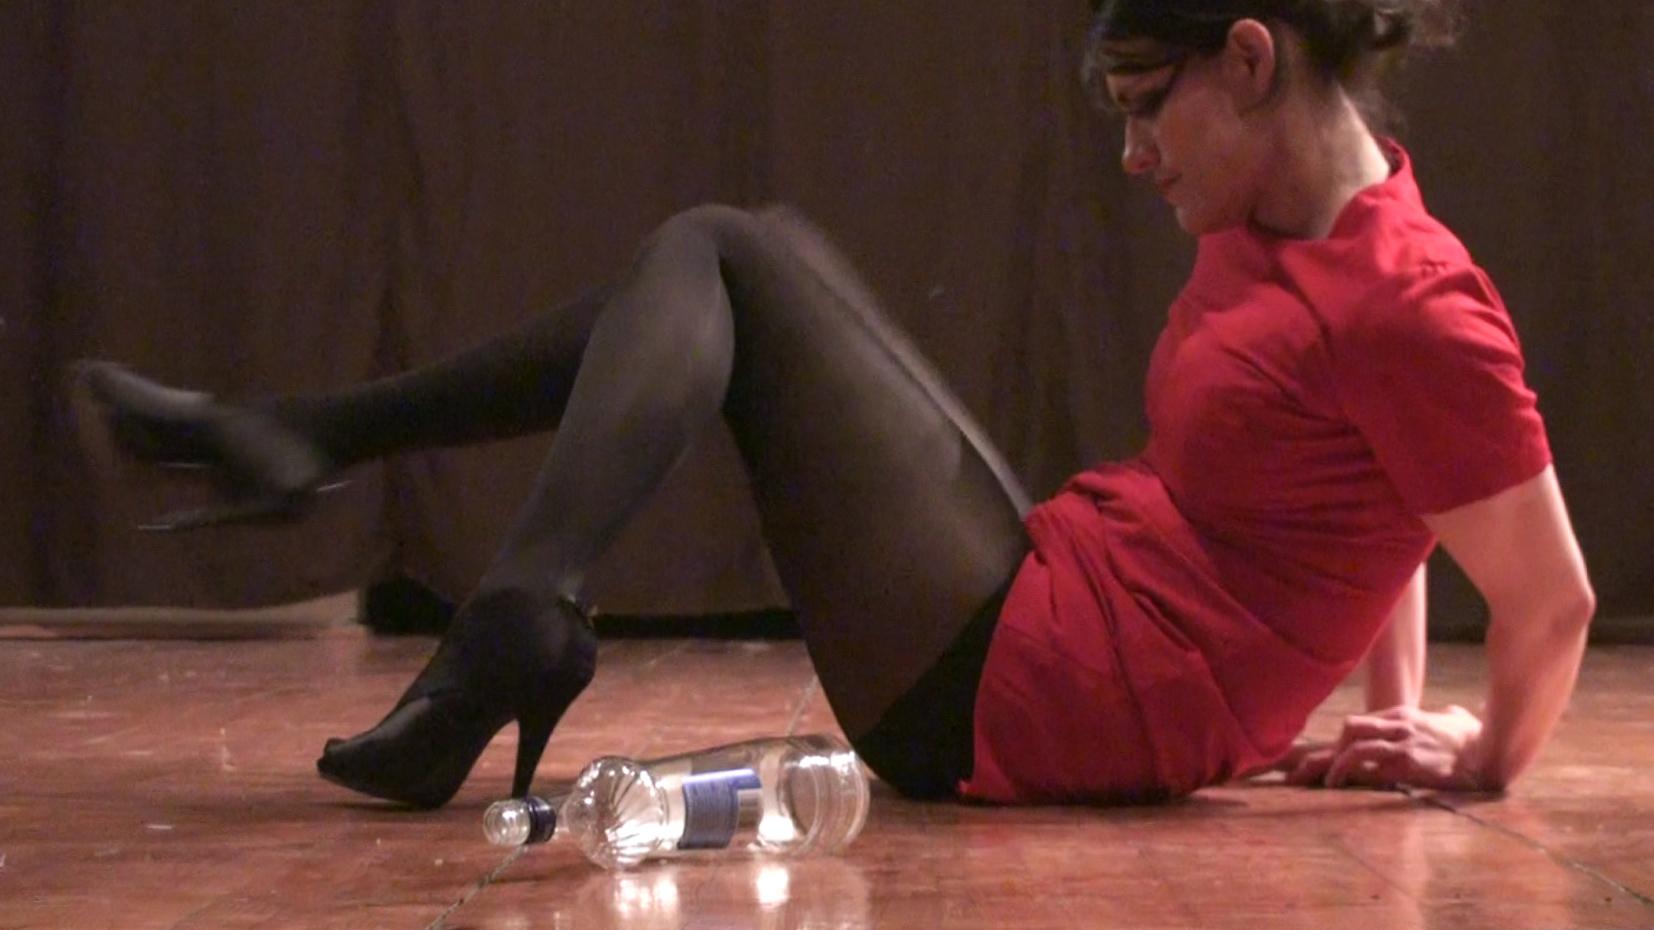 Carbon12Dubai-Anahita Razmi,'Walking drunk in high shoes',video loop,47minutes 23seconds,2010